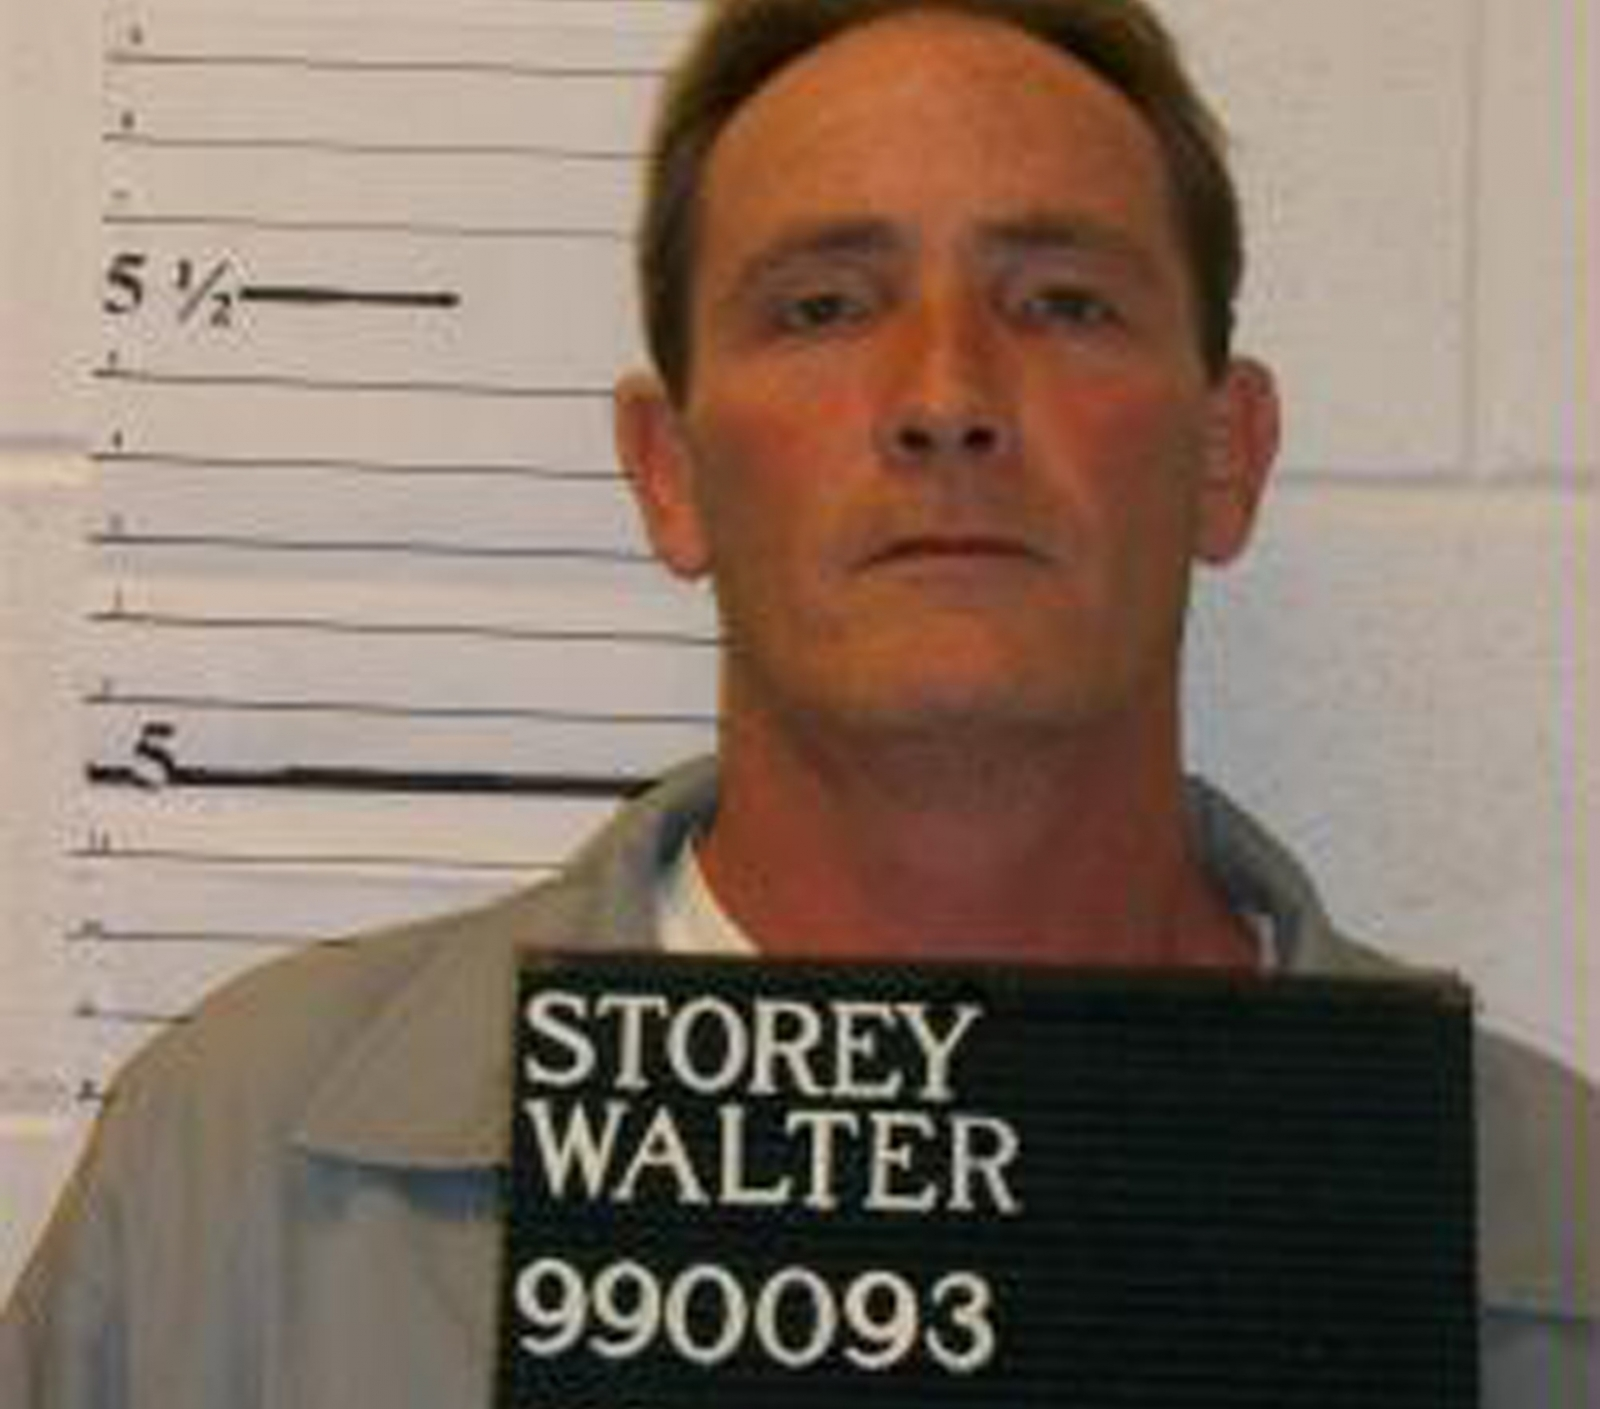 Walter Storey